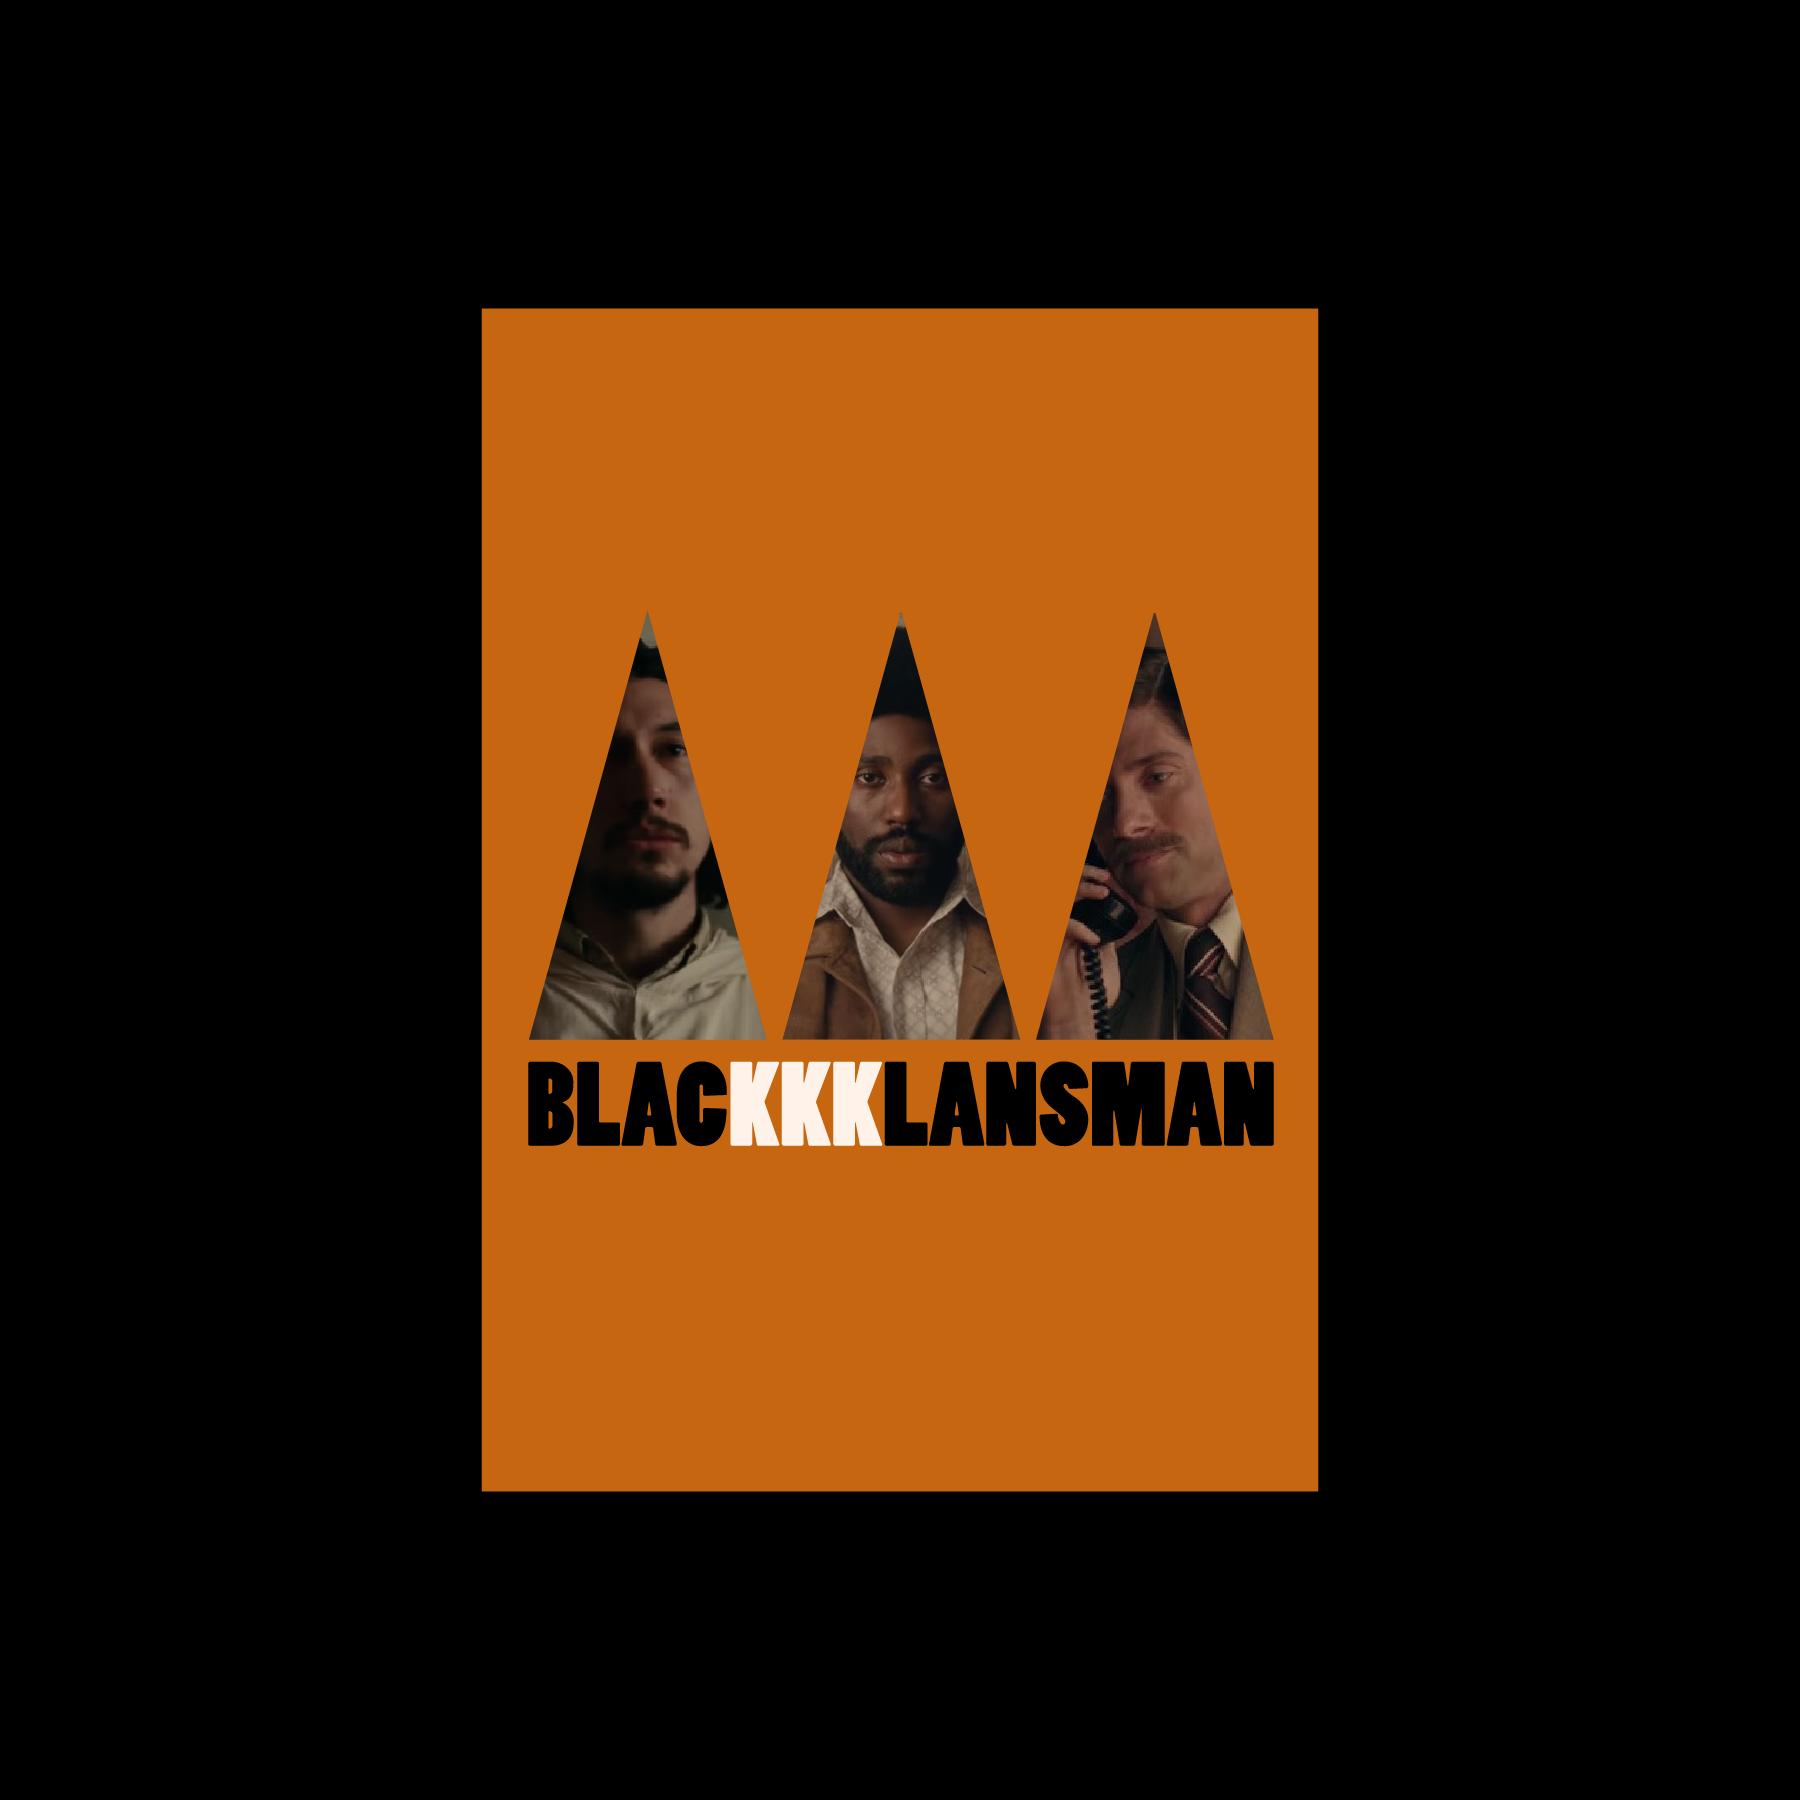 28-08-18_SFF-2018_Blackkklansman.png